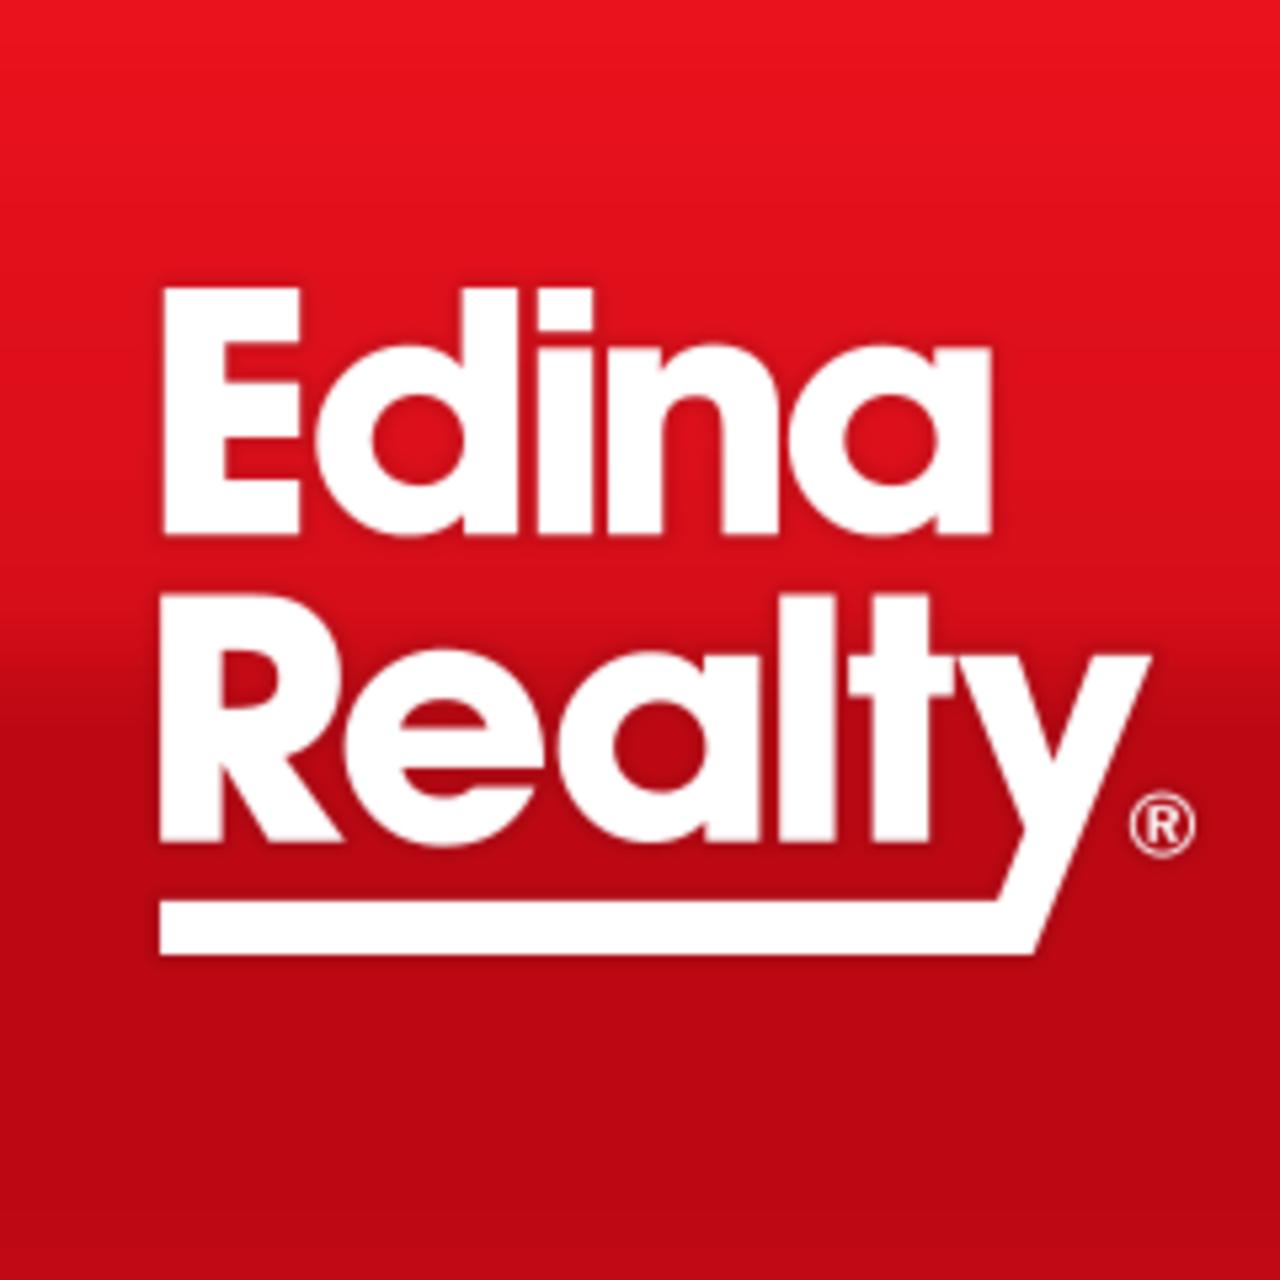 Edina Realty - Willmar - Real Estate - Real Estate Agents in Willmar MN